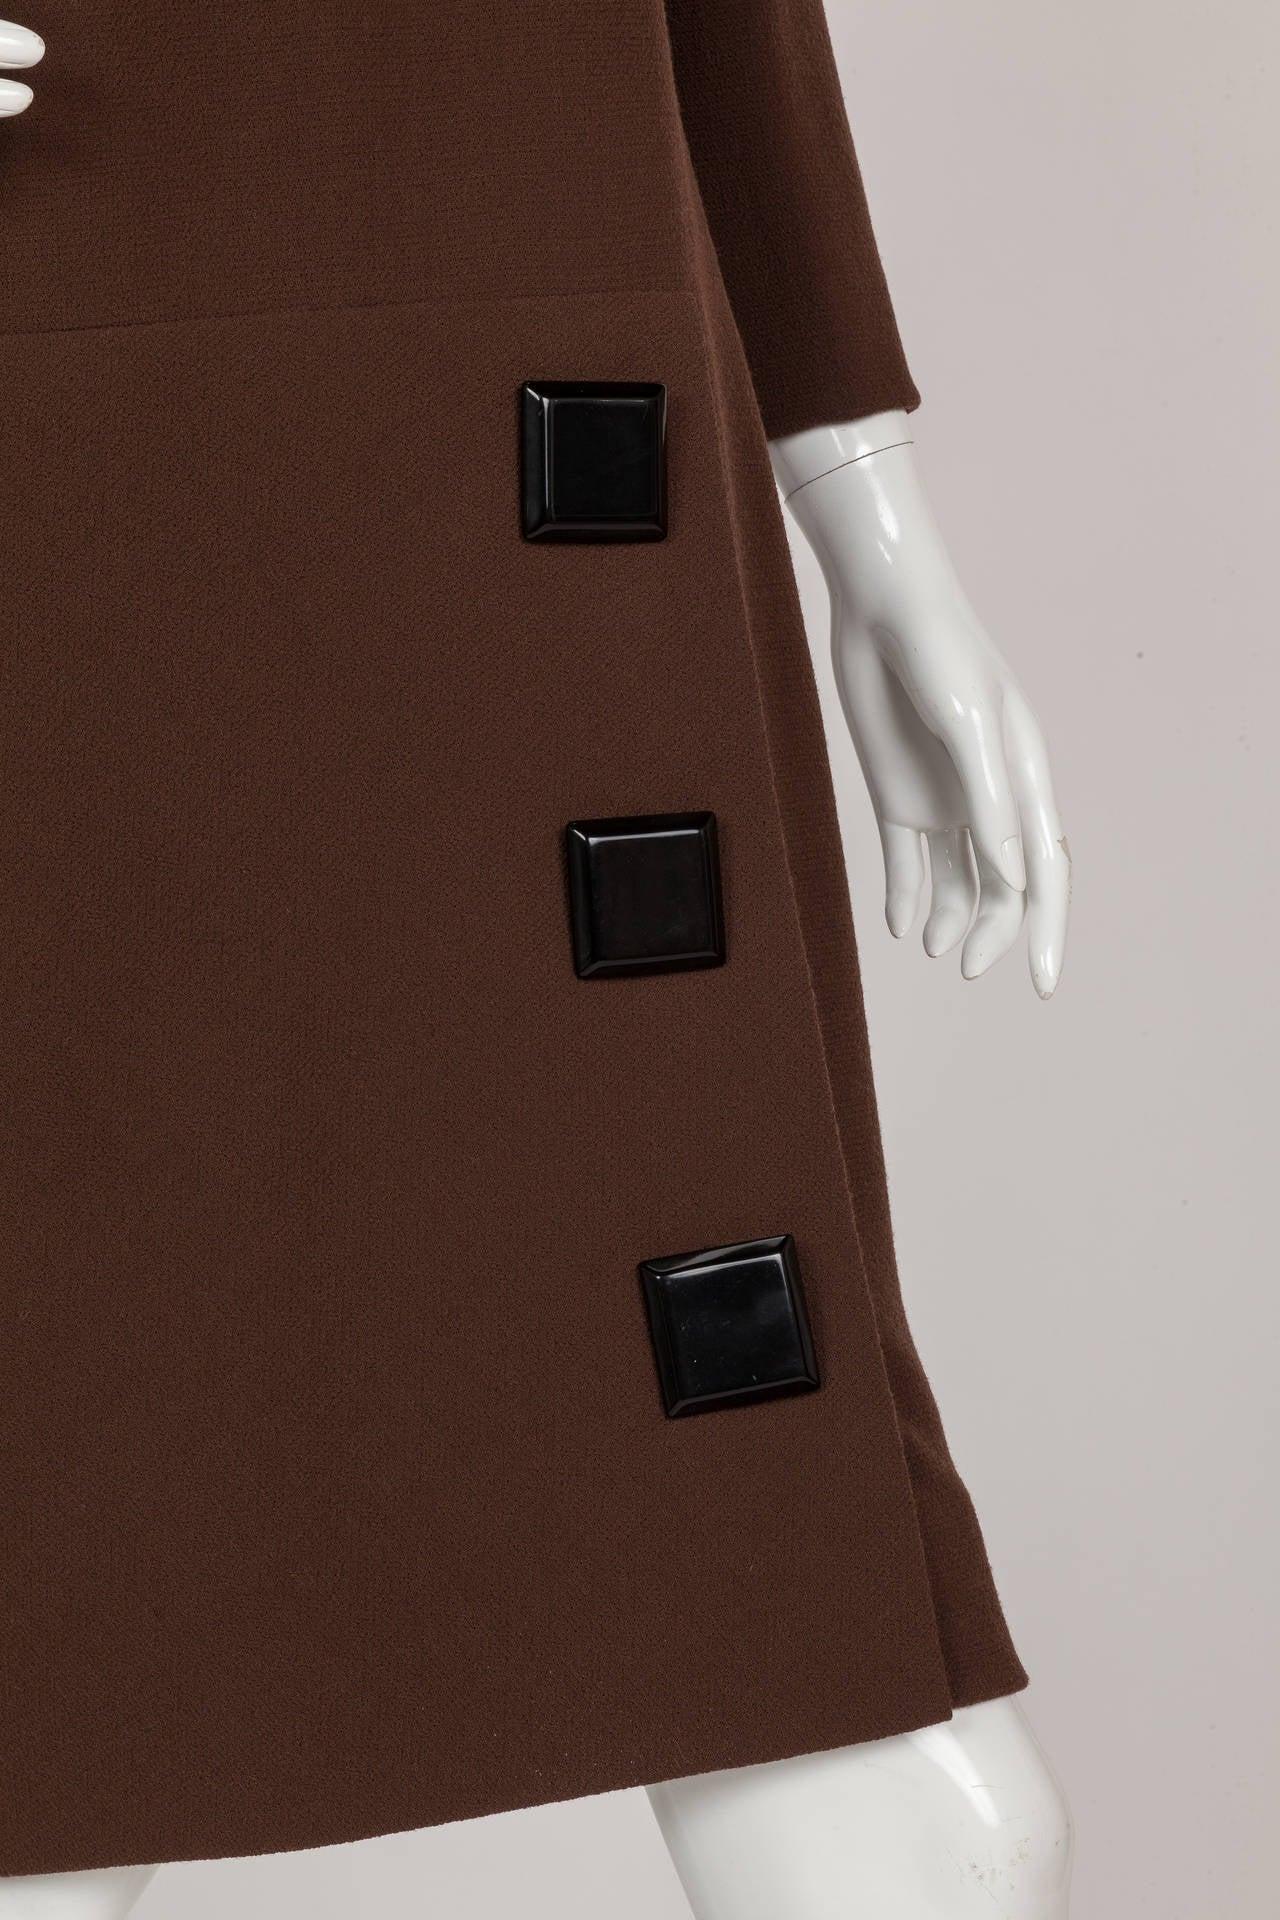 Avant Garde Pierre Cardin Haute Couture Asymmetric Wool Cocktail Dress ca. 1992 For Sale 1